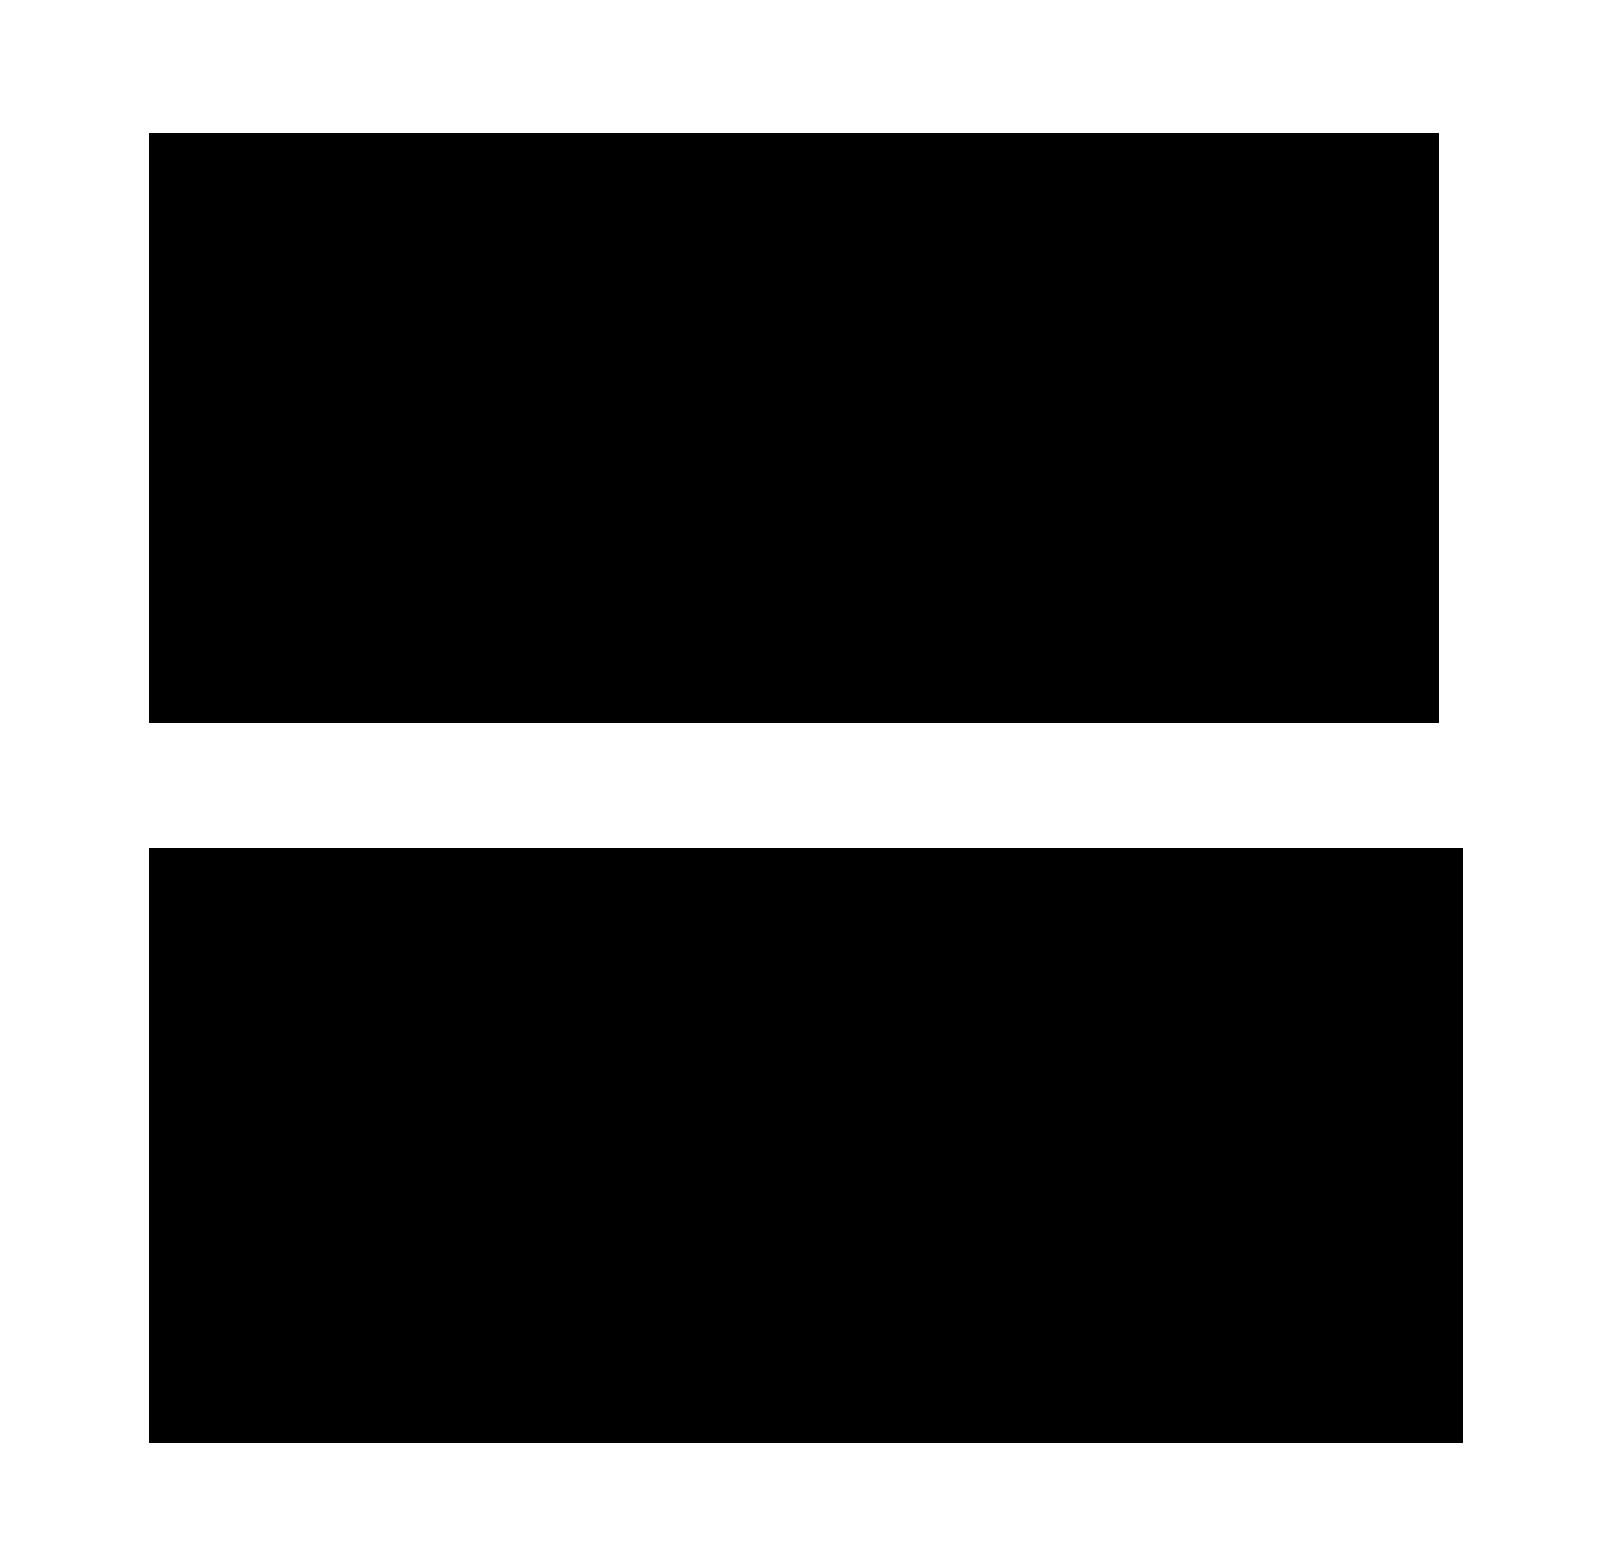 the-max-logo-concepts-01